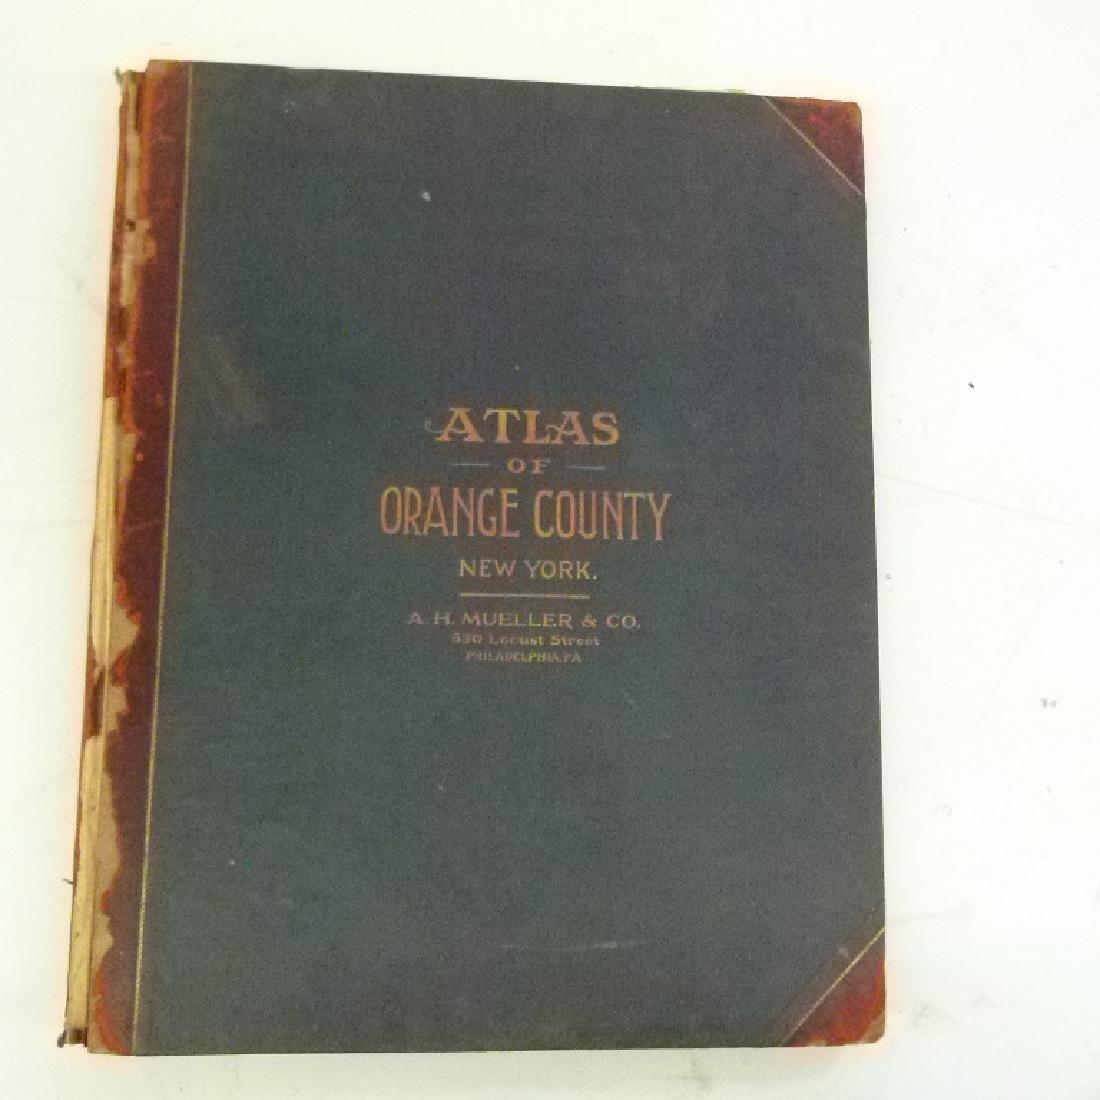 (2) ATLAS OF ORANGE COUNTY NY, A.H. MUELLER 1903 - 2